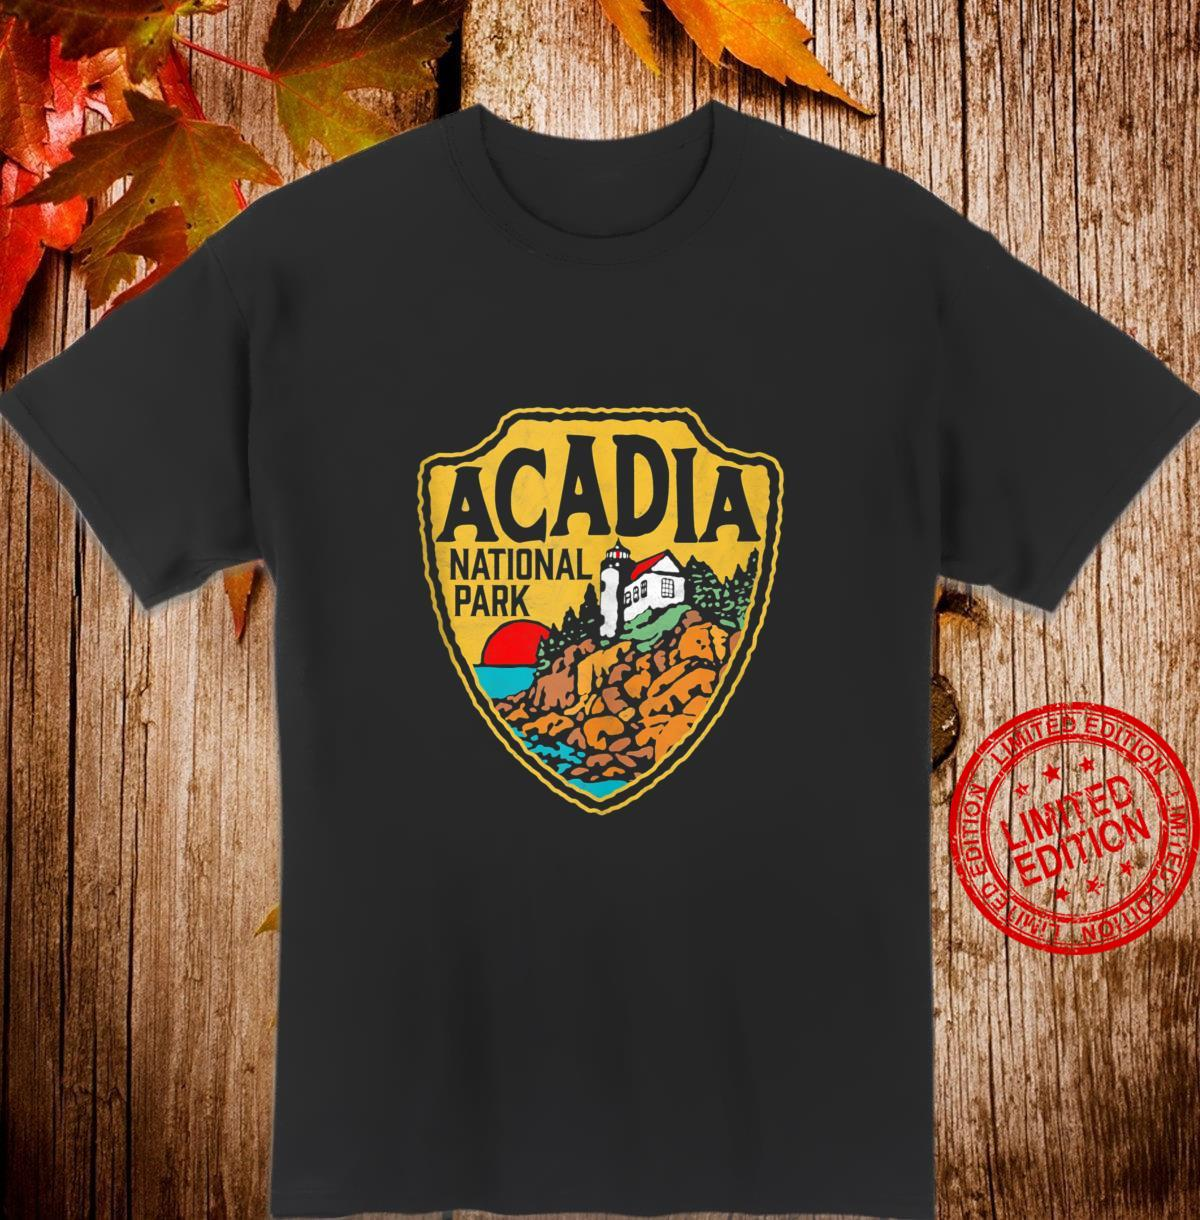 Acadia National Park Vintage Lighthouse Badge Distressed Shirt